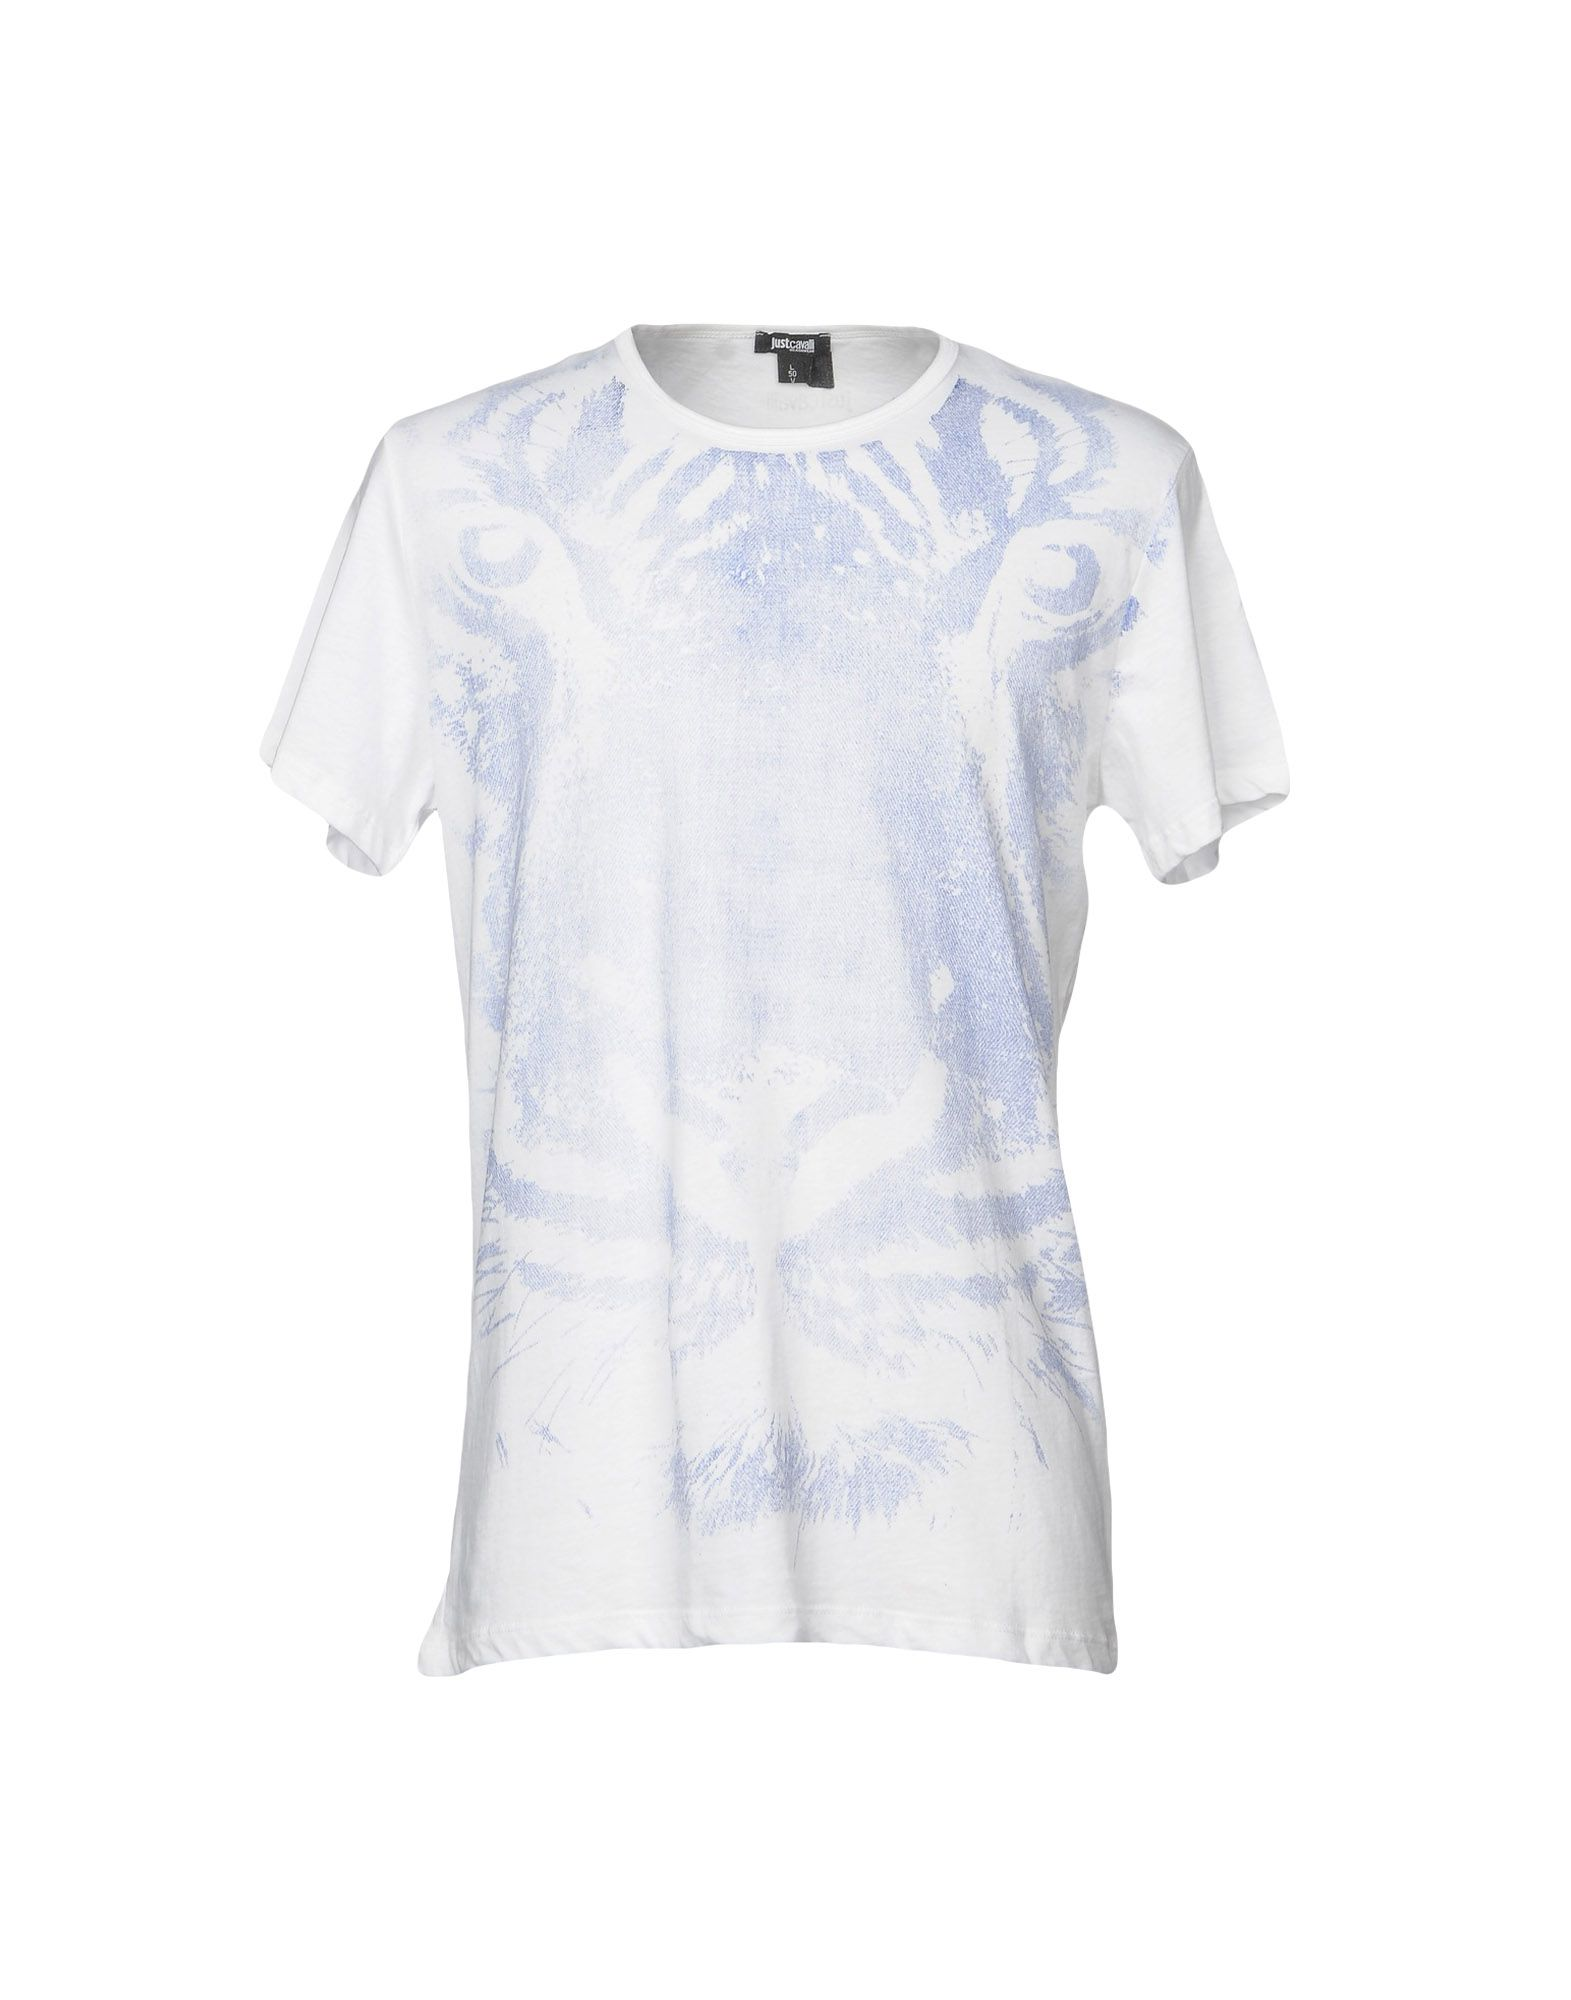 T-Shirt Just Cavalli Uomo Beachwear Uomo Cavalli - 12096957SK 63b547